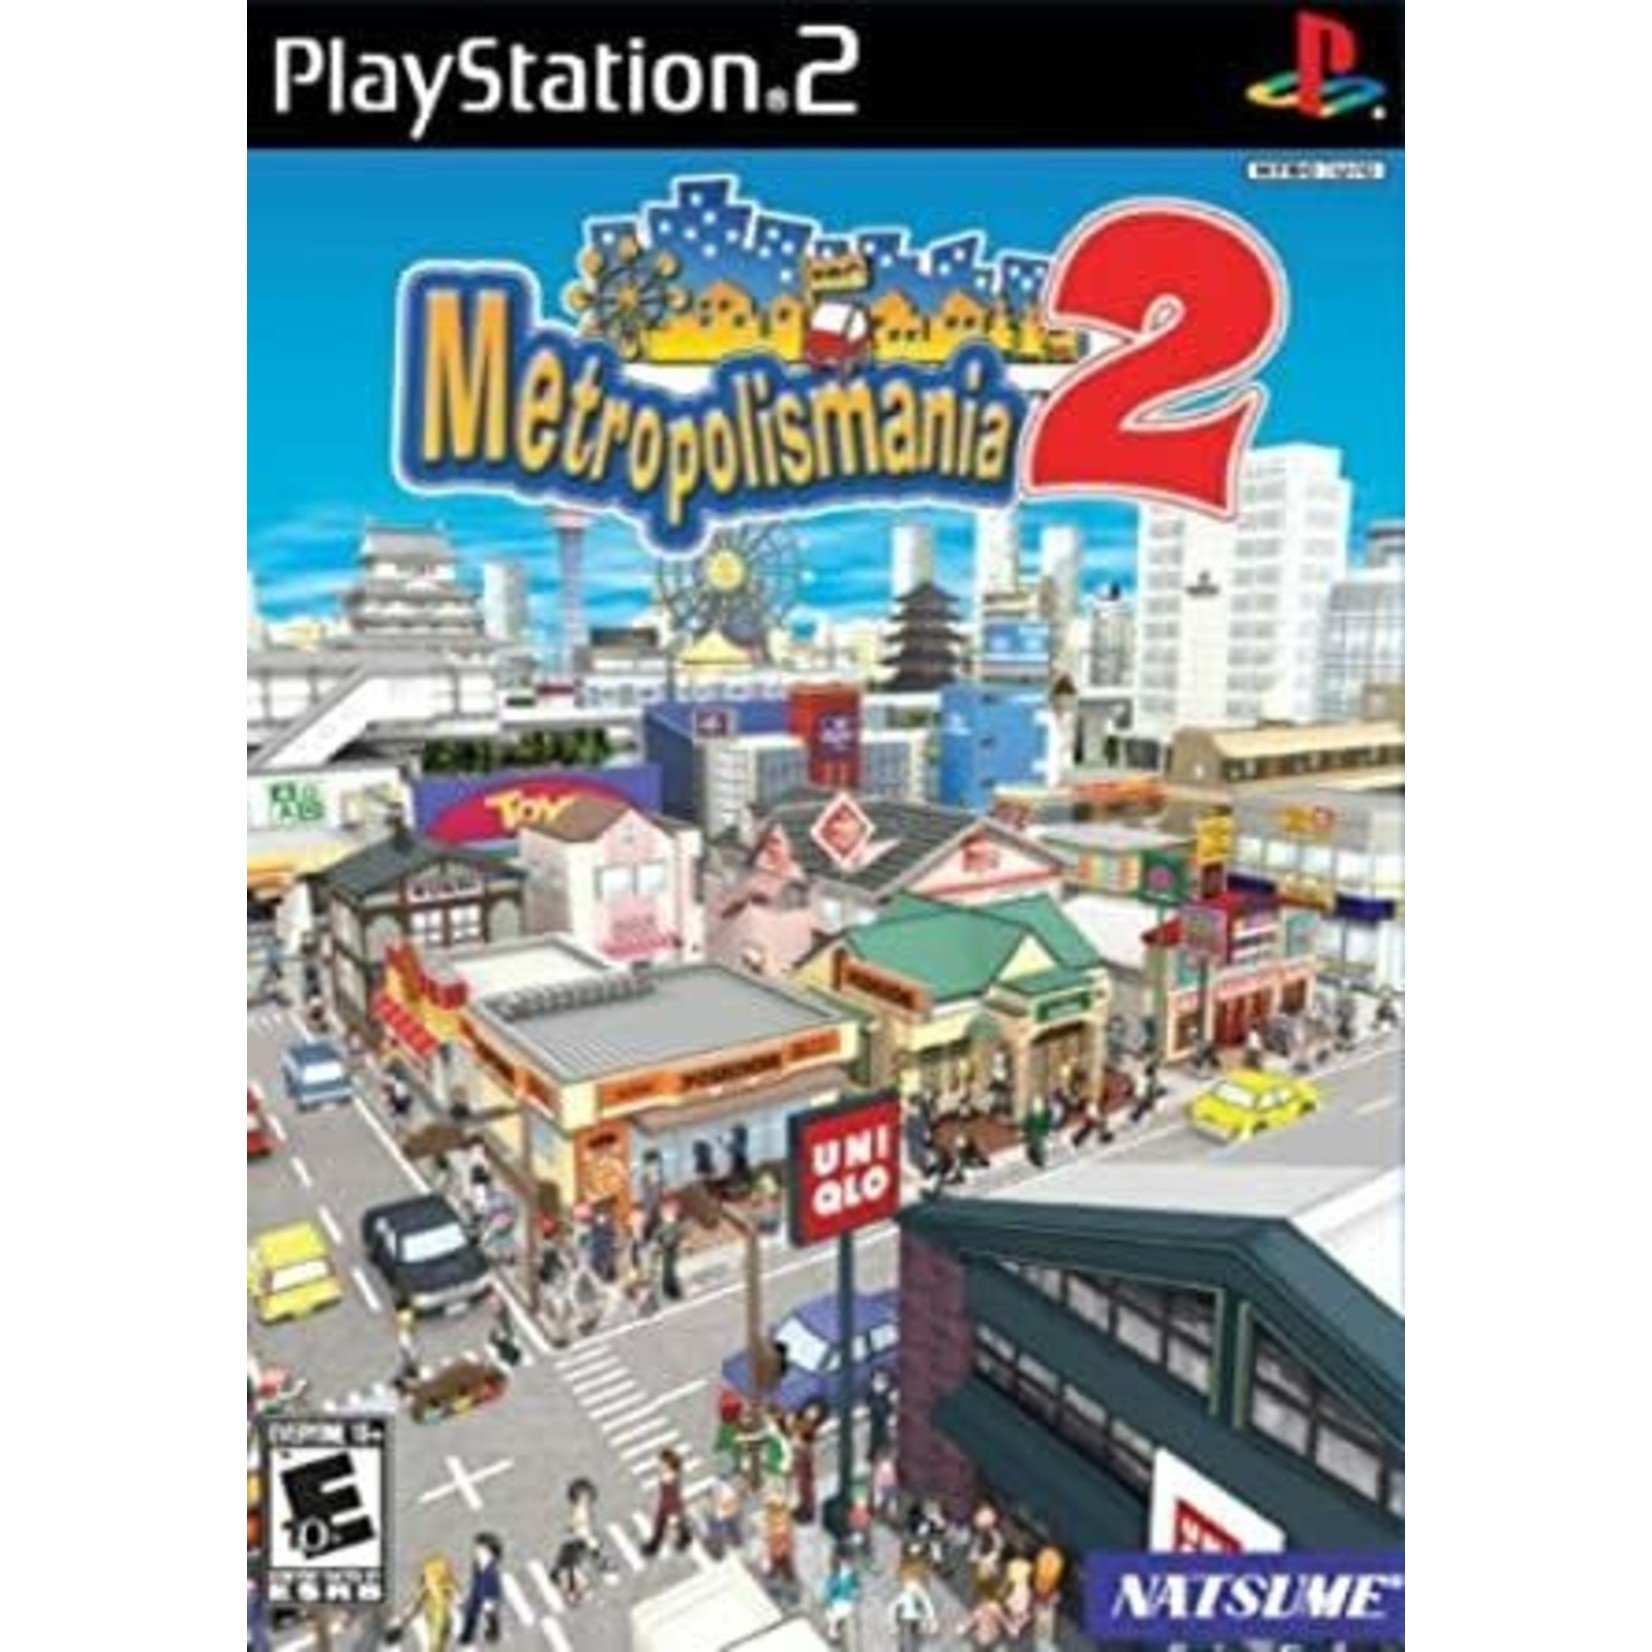 PS2U-Metropolismania 2